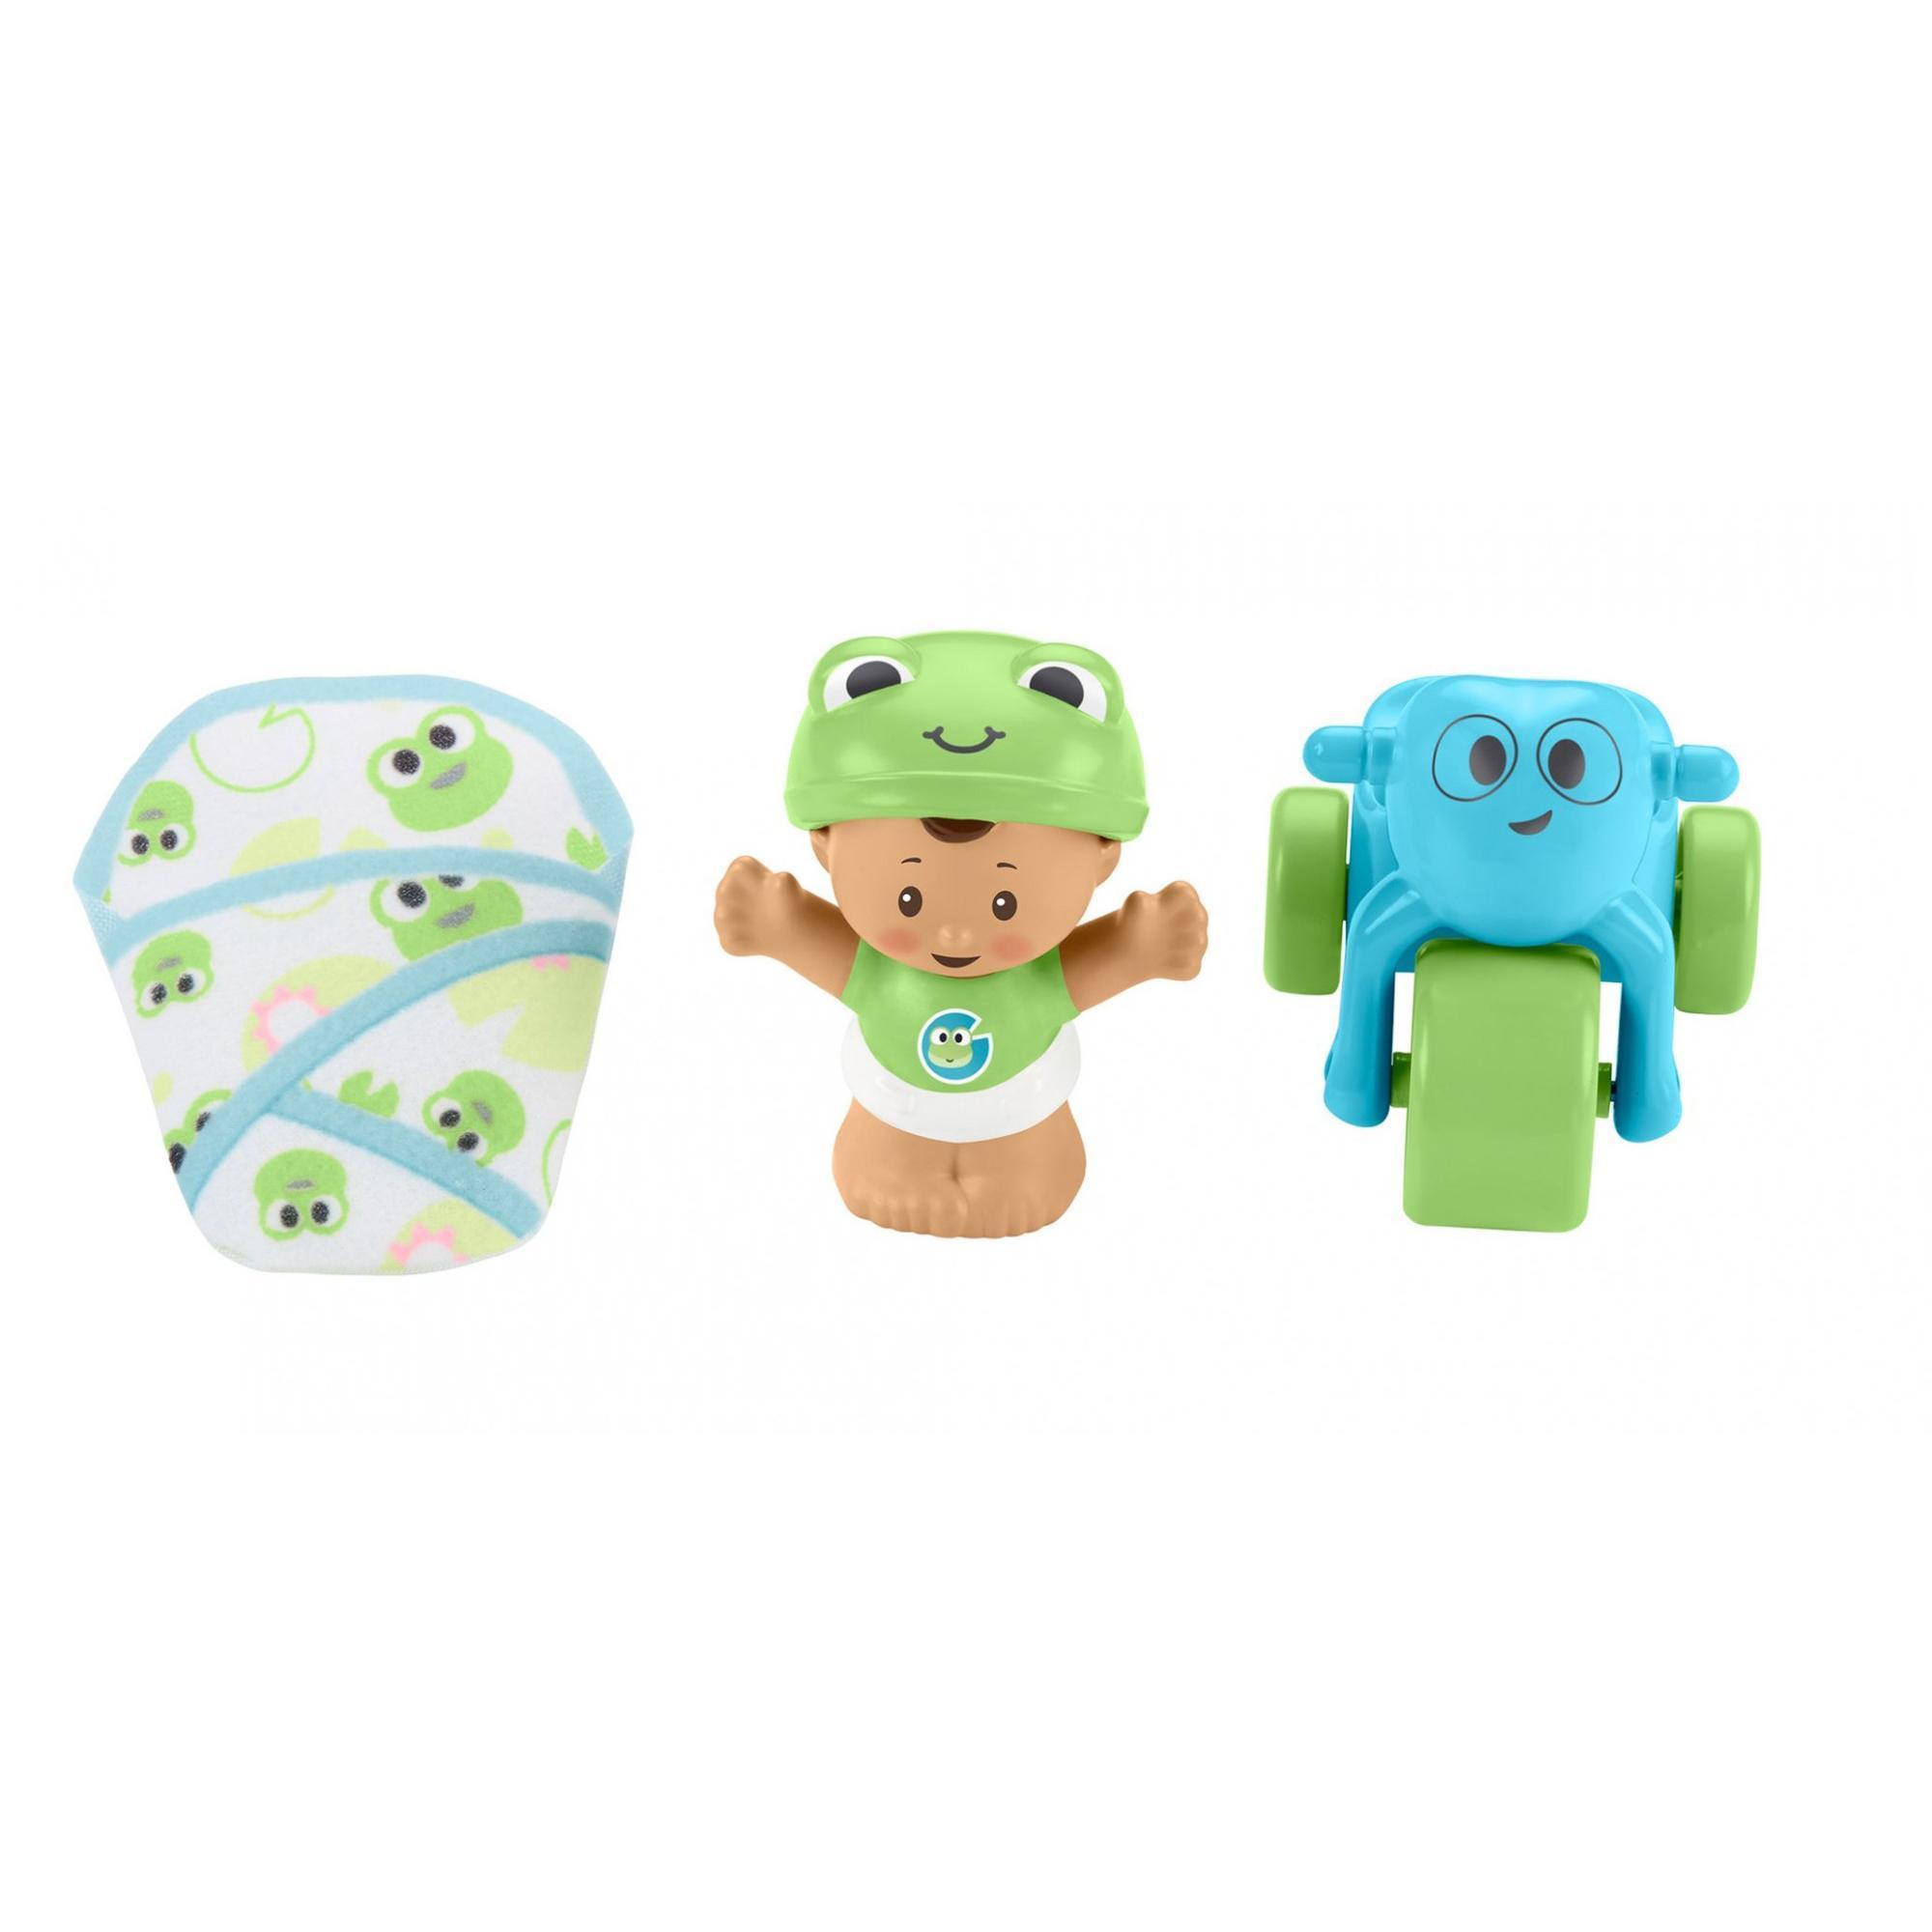 Little People - Figurine Bundle'n play